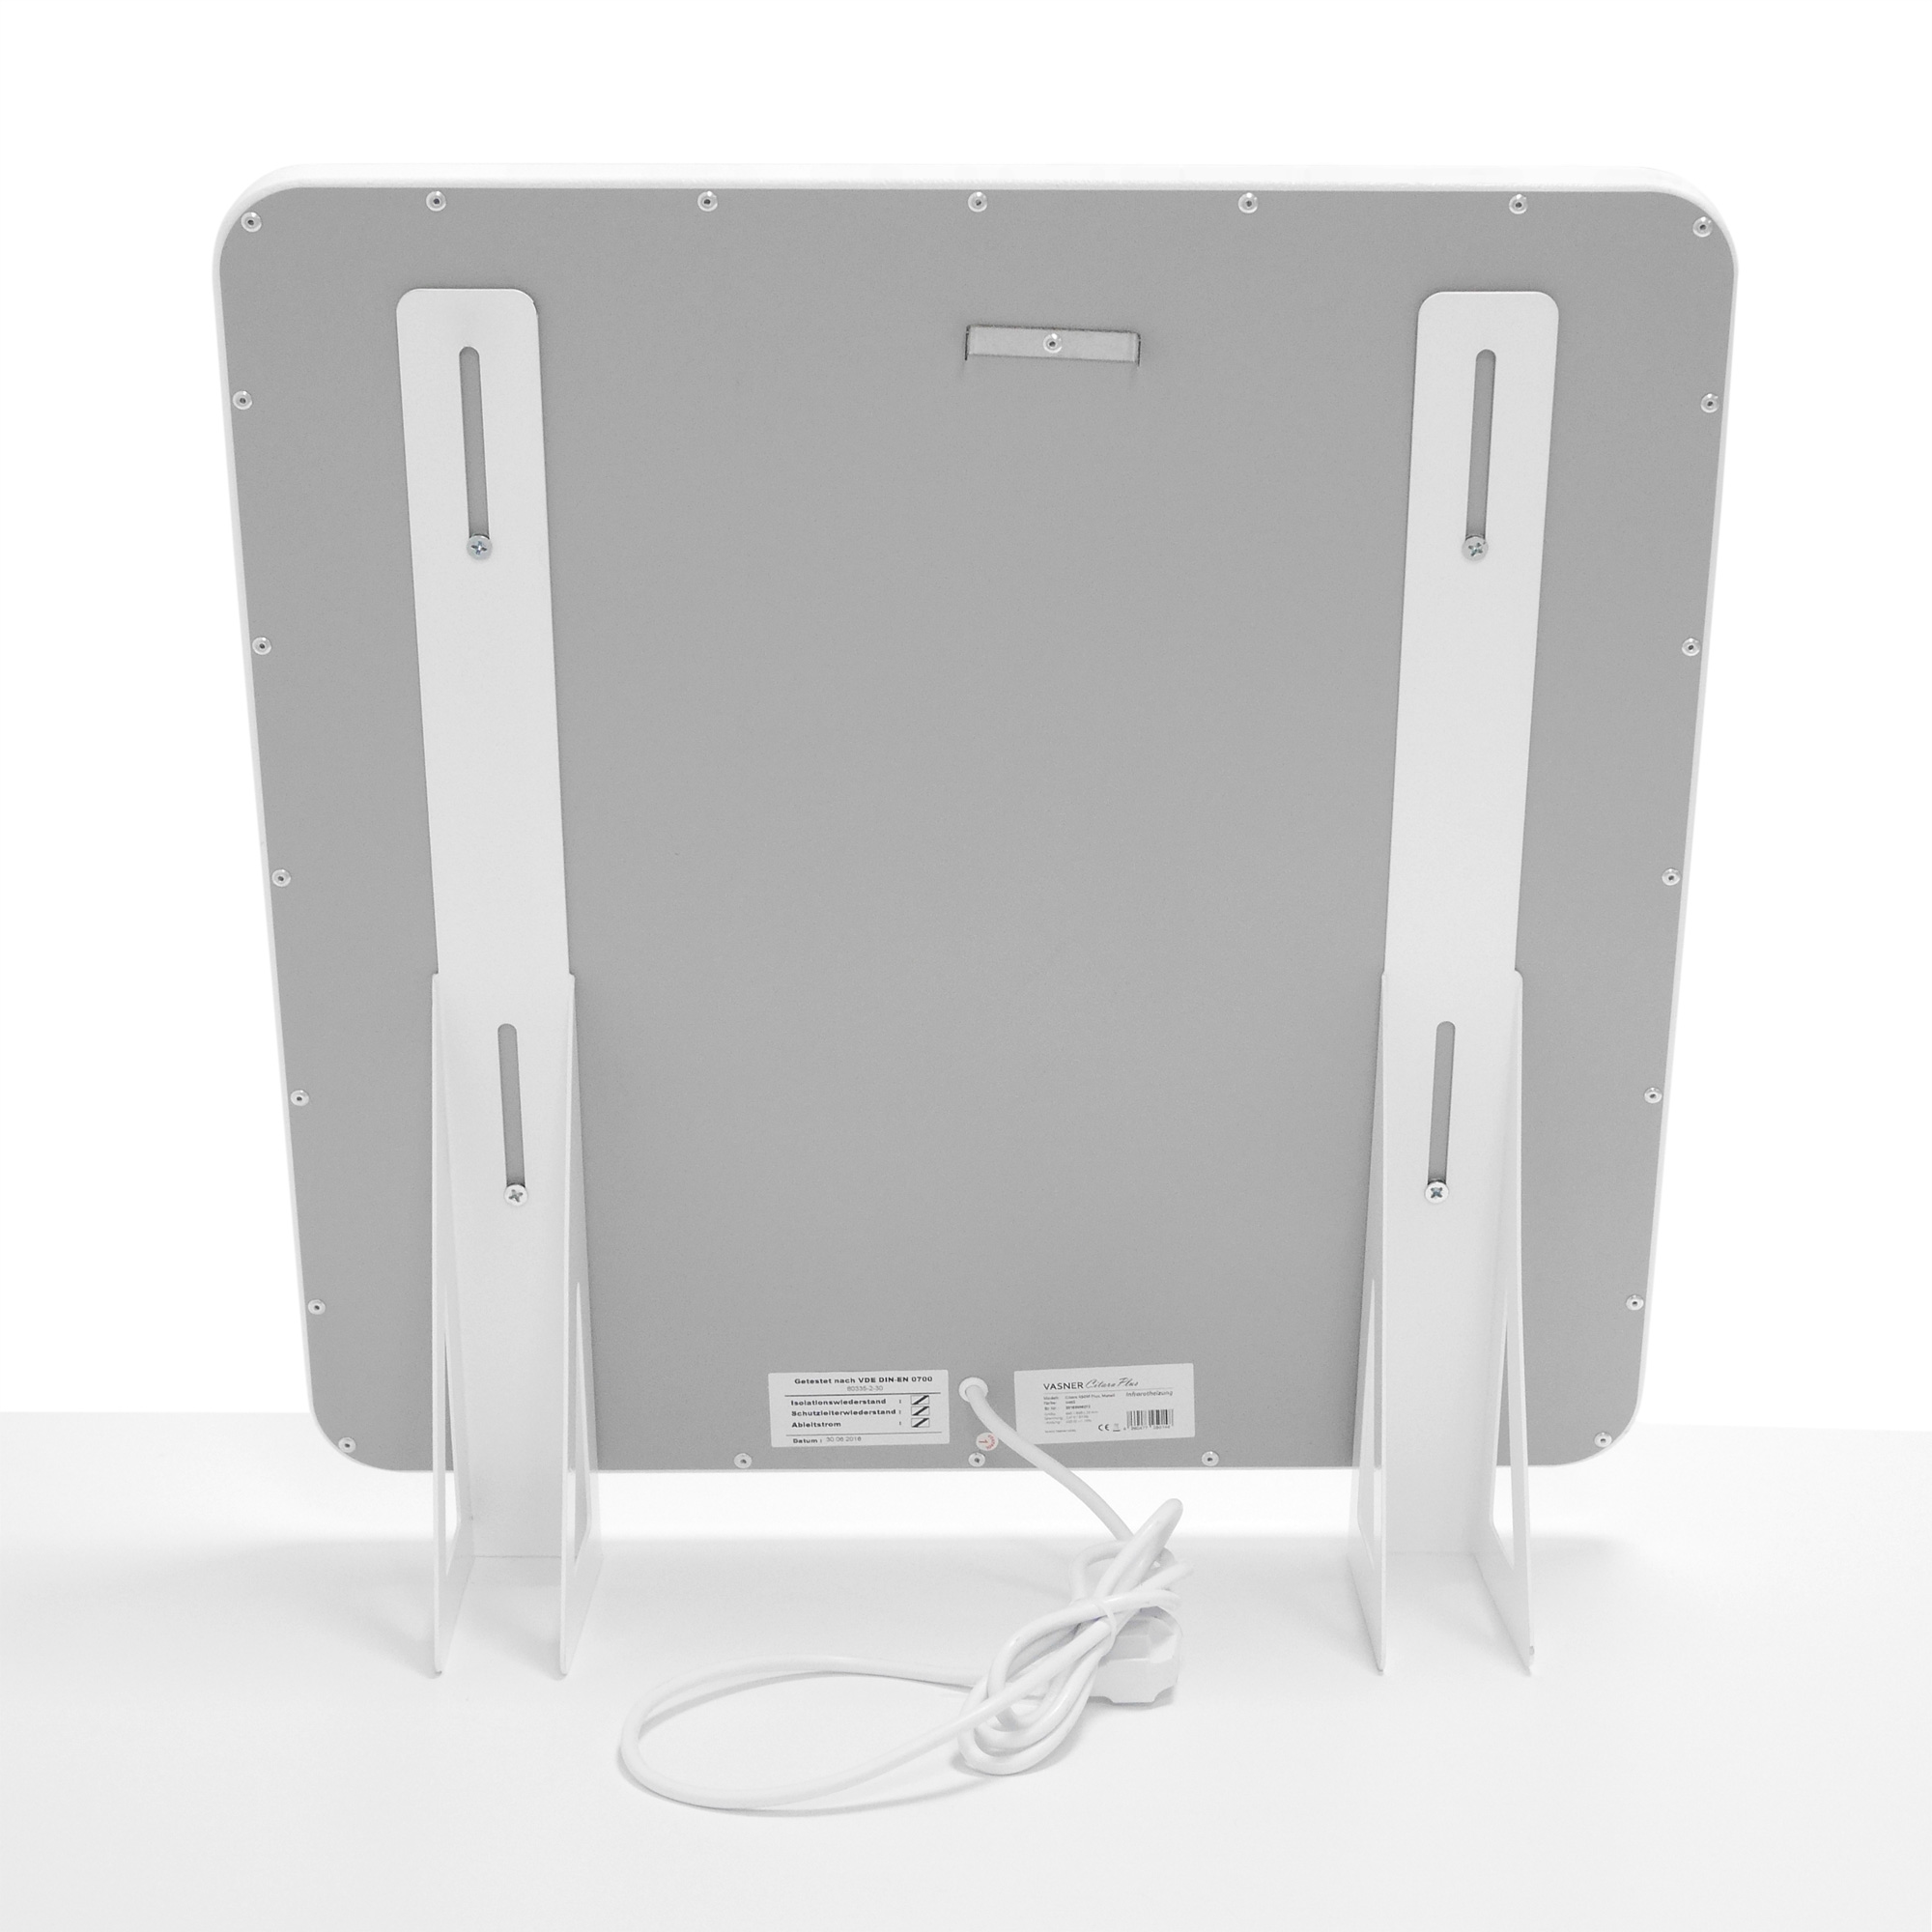 Flexible Tiny House Heizung mit Netzstecker & Standfüßen